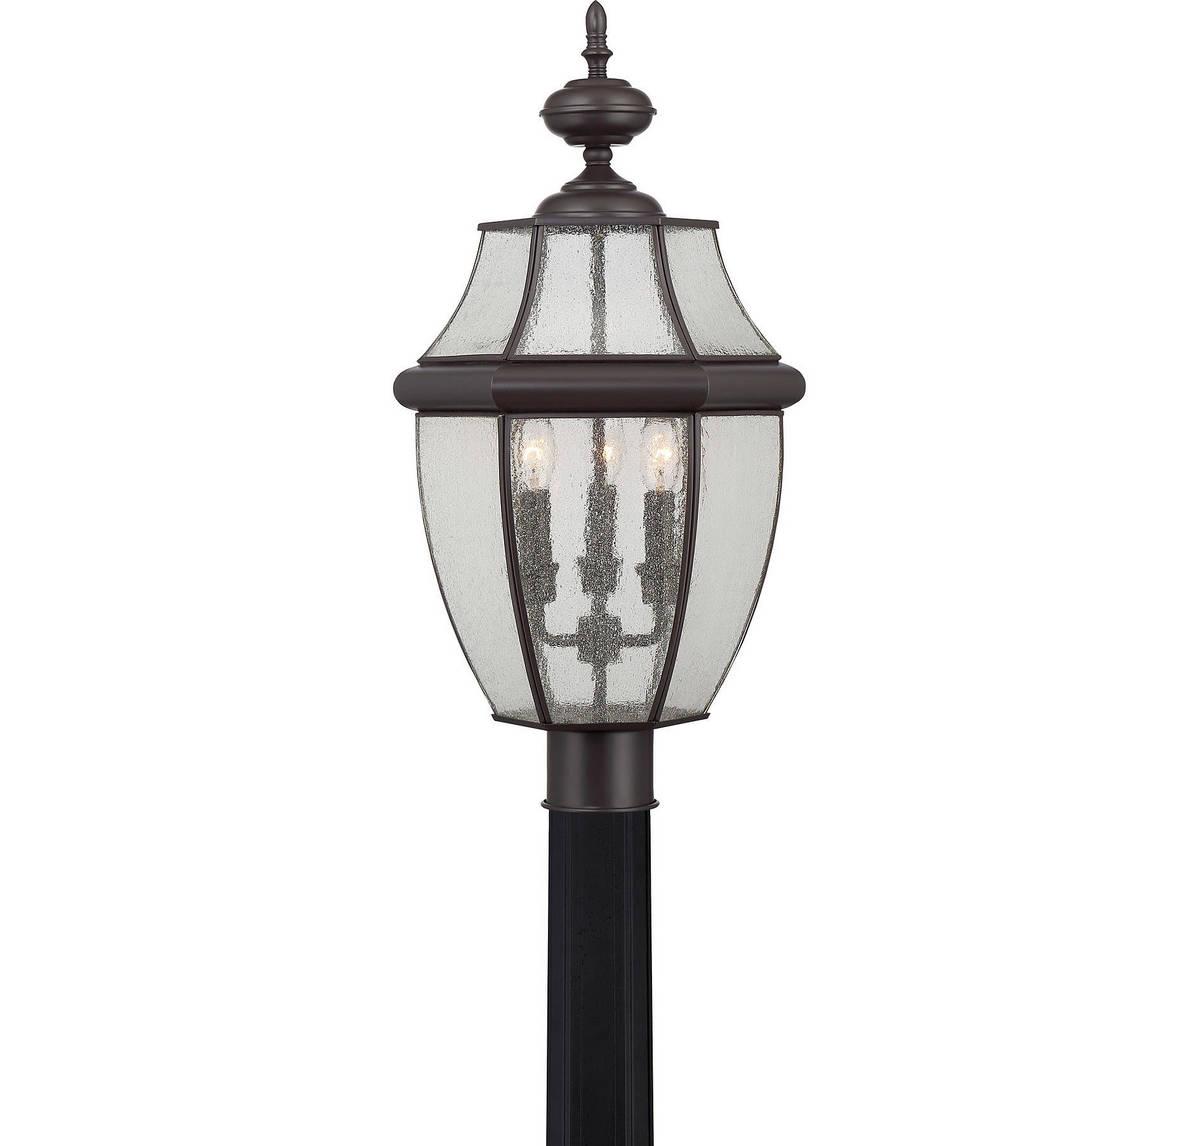 Quoizel Newbury 23 3-Light Post Lantern in Medici Bronze